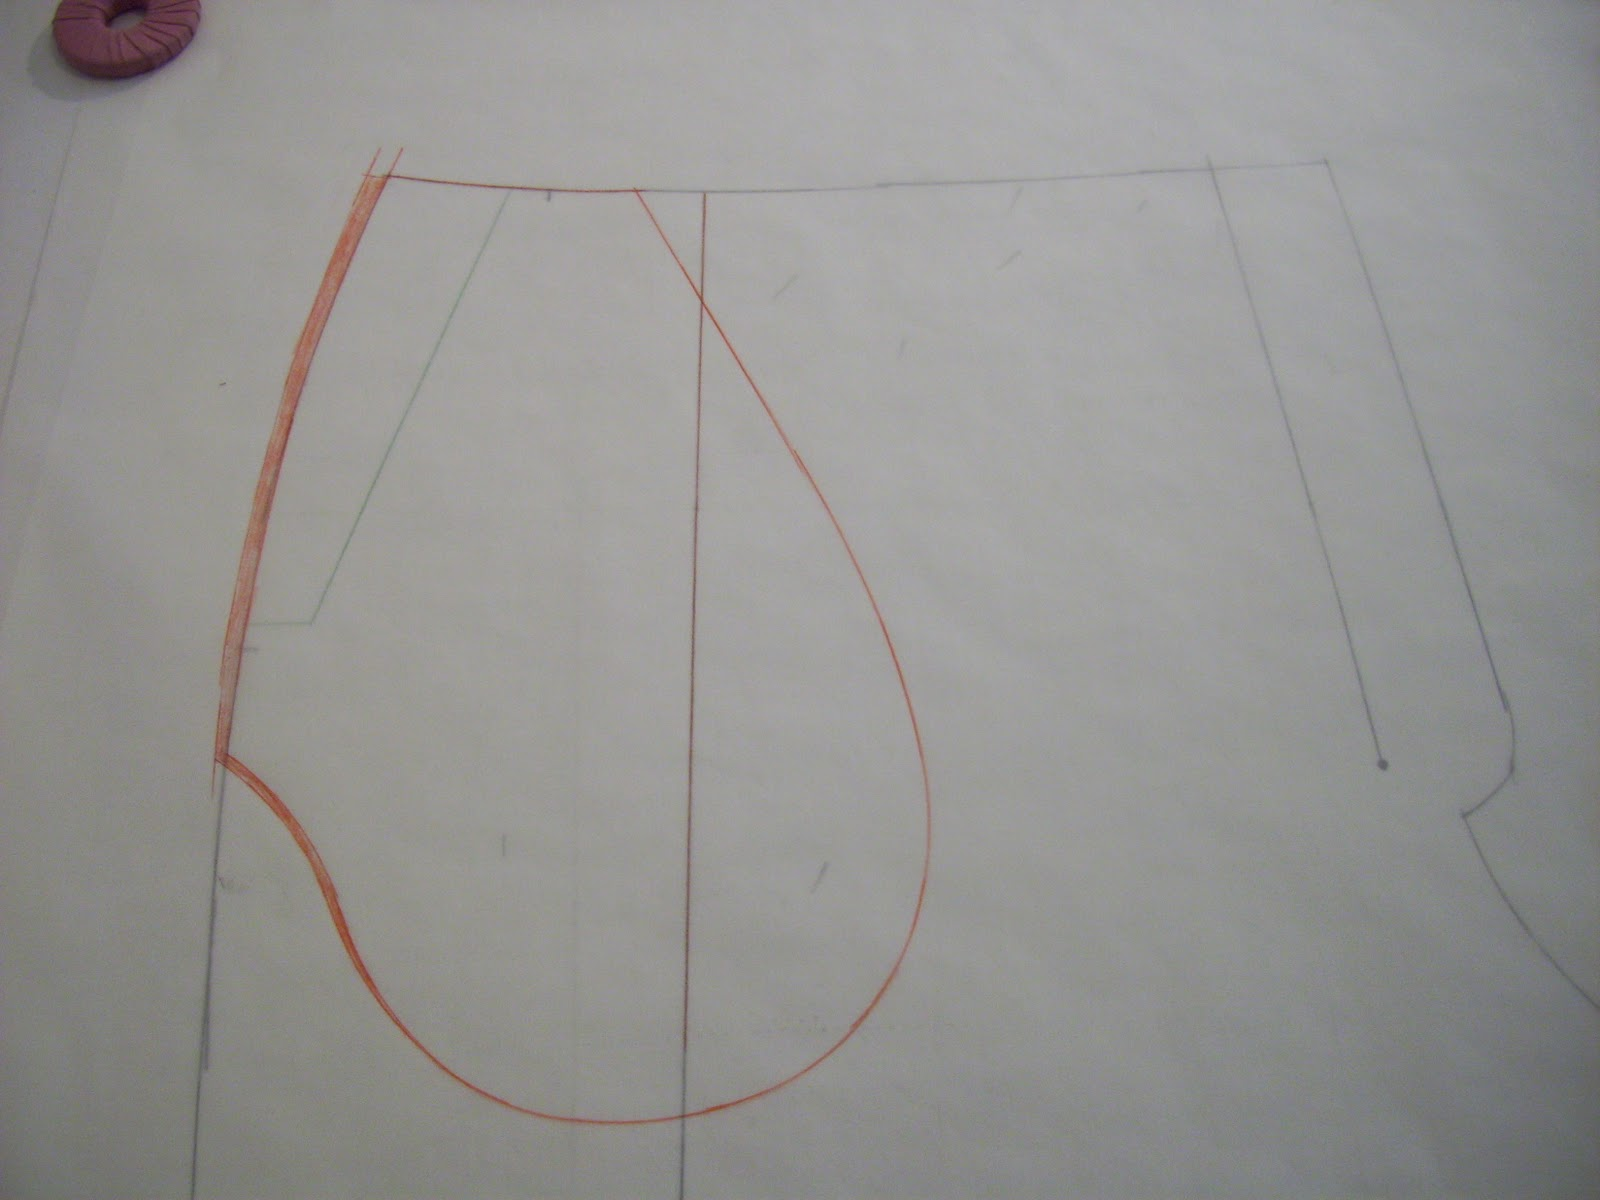 http://4.bp.blogspot.com/--LZKnAyW_Gk/TrB-iamE5_I/AAAAAAAADFY/dRmLoBDCkvE/s1600/Hip+yoke+adjustment.JPG